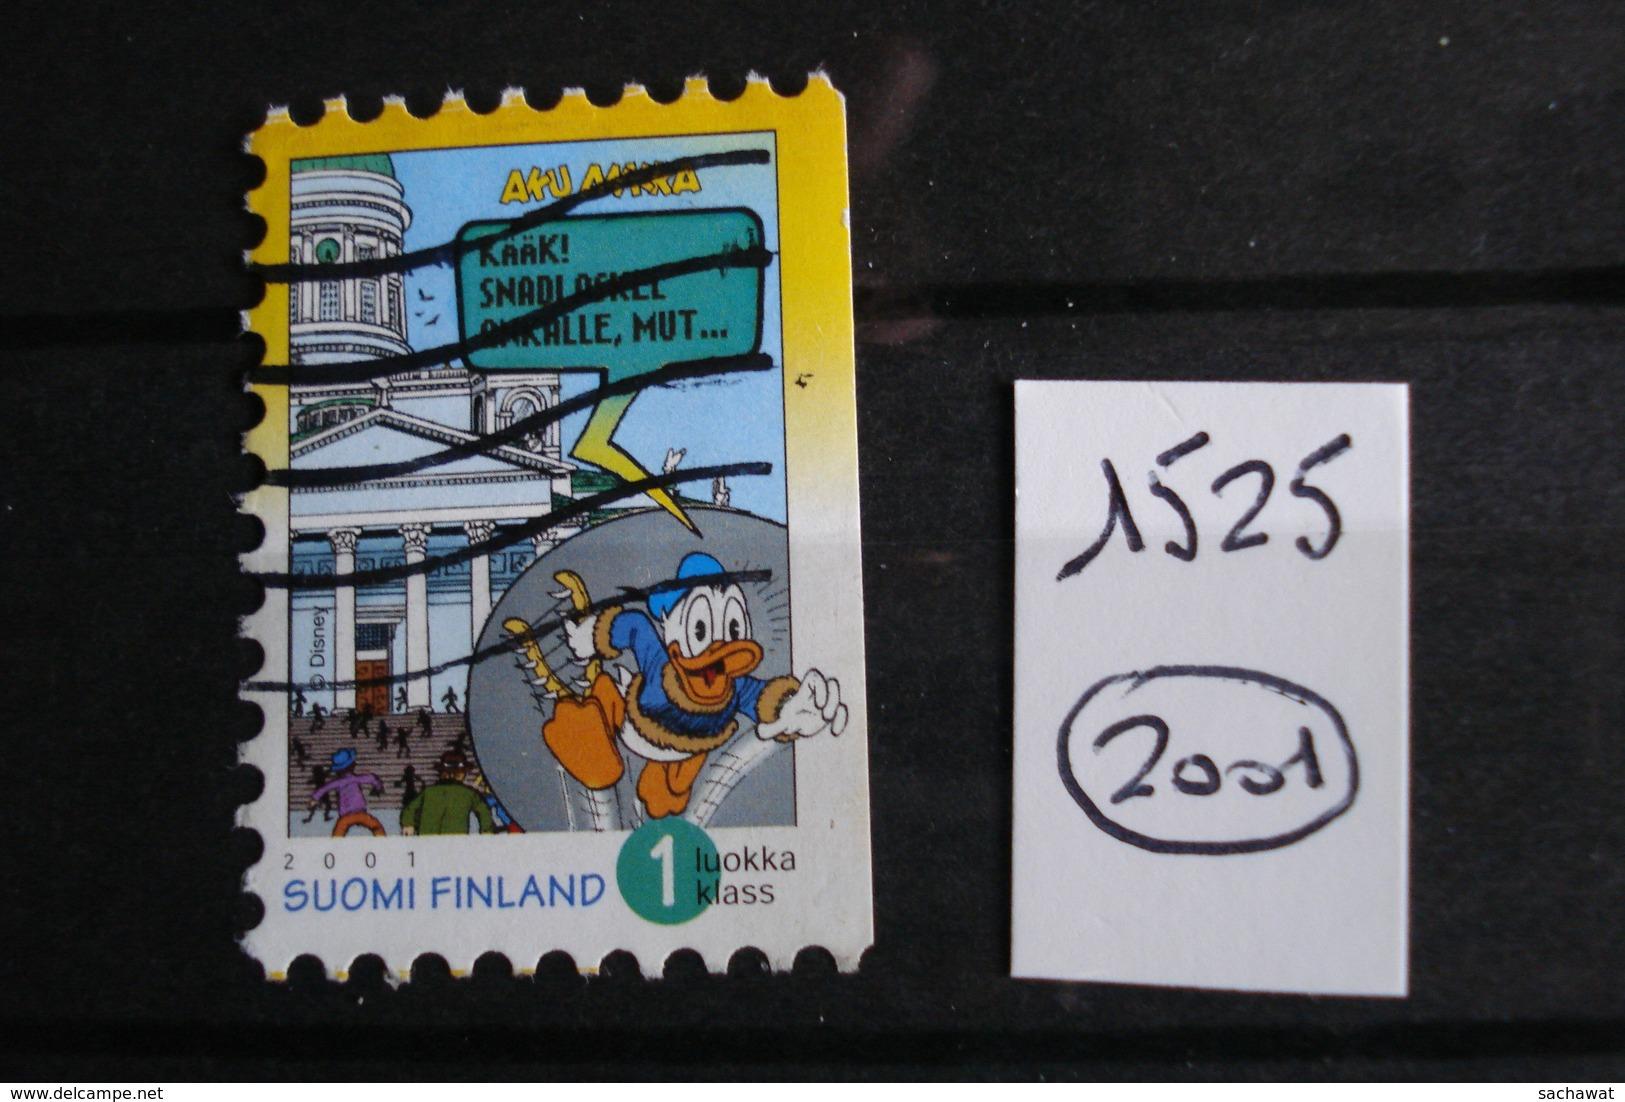 Finlande - Année 2001 - Magazine Aku Ankla - Y.T. 1525 - Oblitéré - Used - Gestempeld - Gebraucht